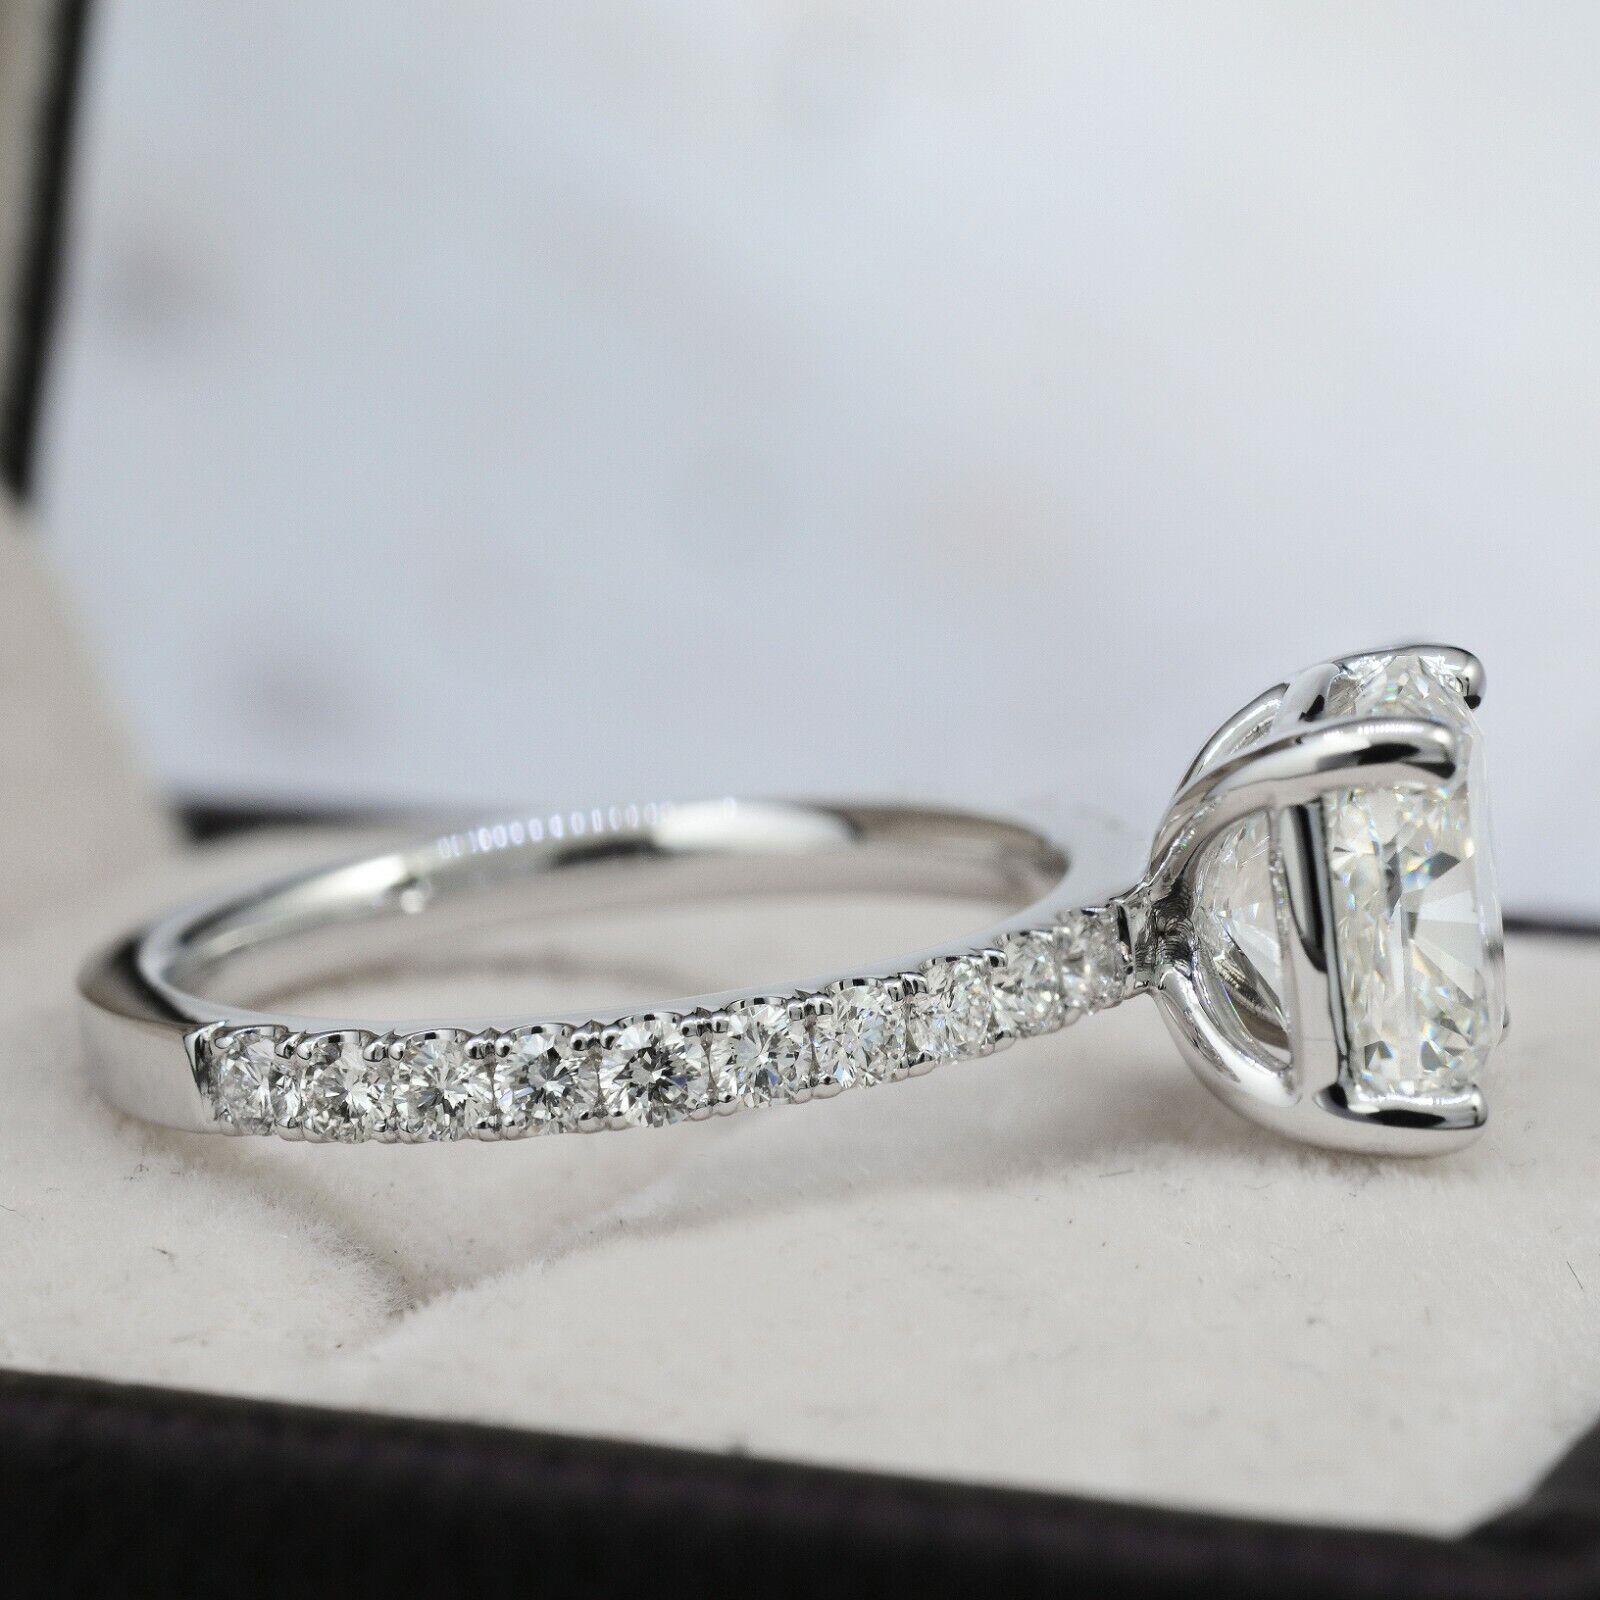 Dazzling 2.10 Ct. Cushion Cut Diamond Engagement Ring Bridal Set GIA Certified 1